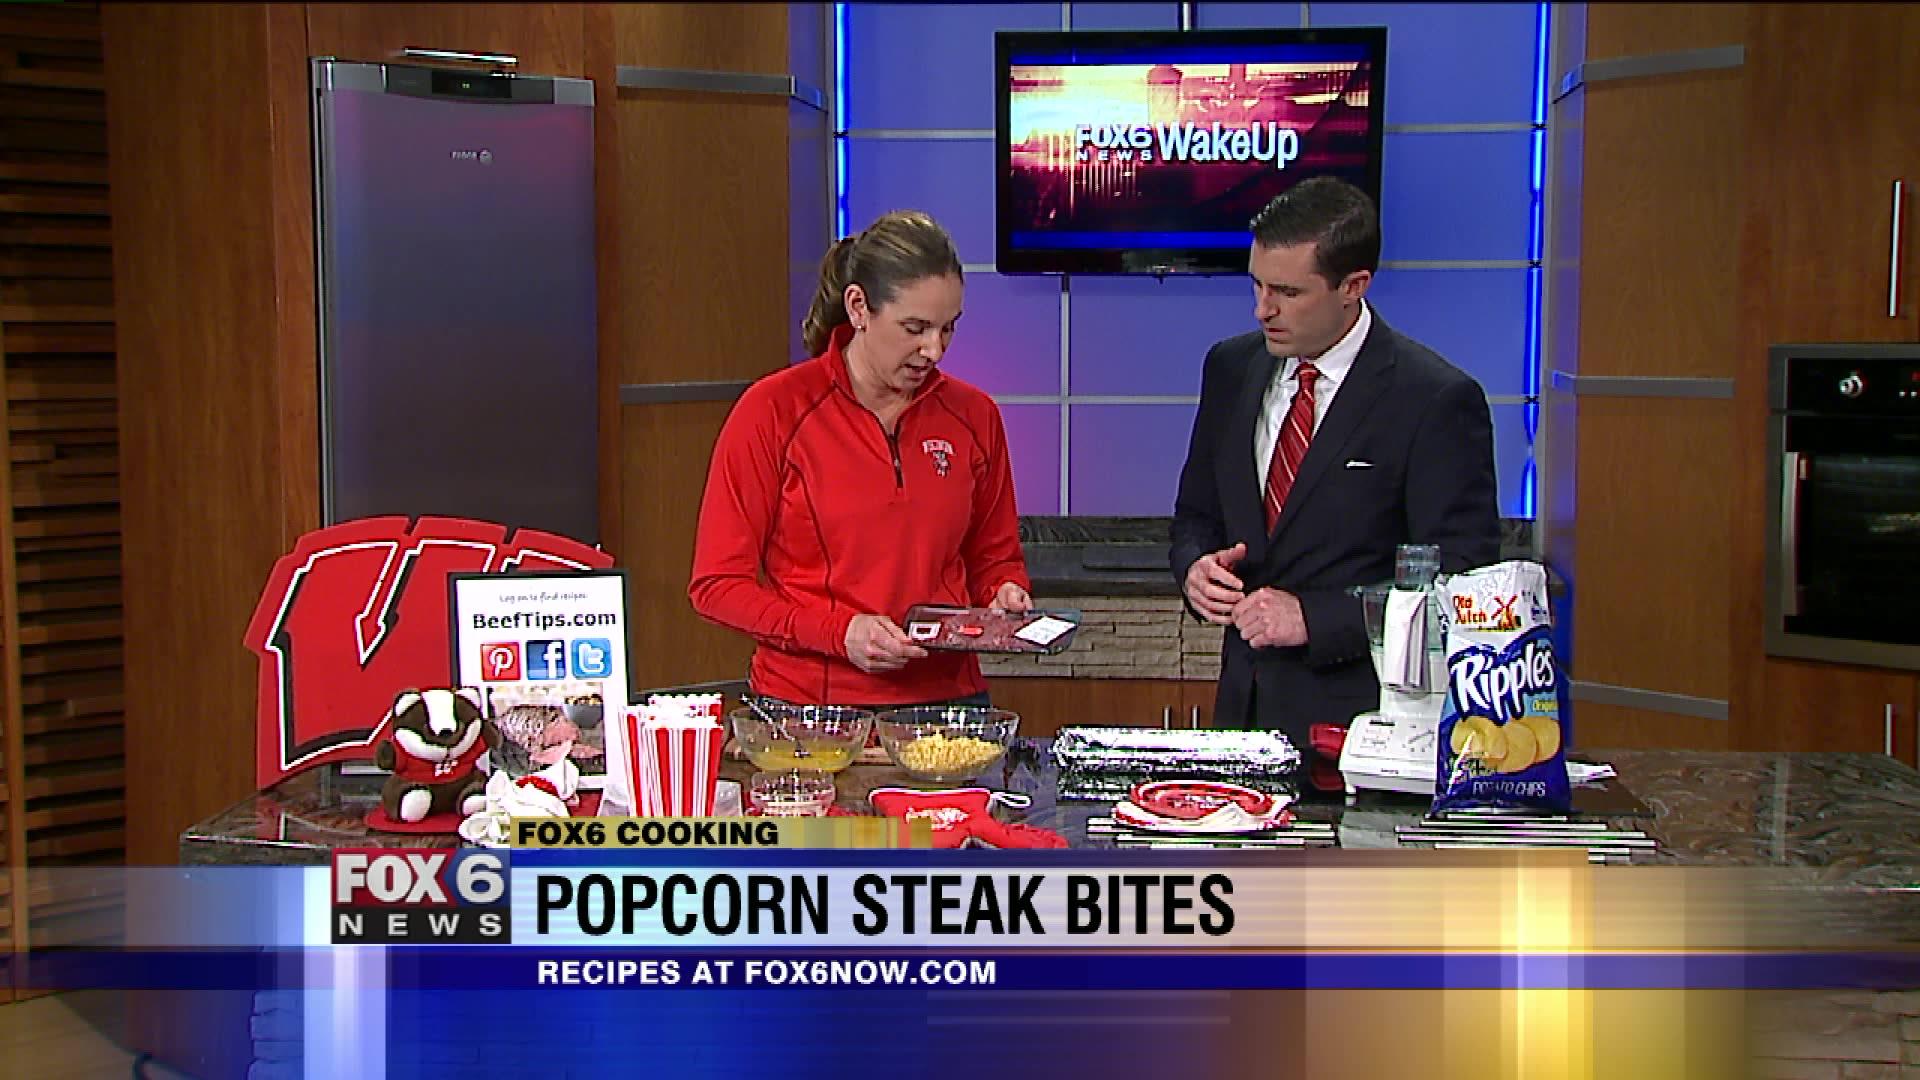 How To Make Popcorn Steak Bites